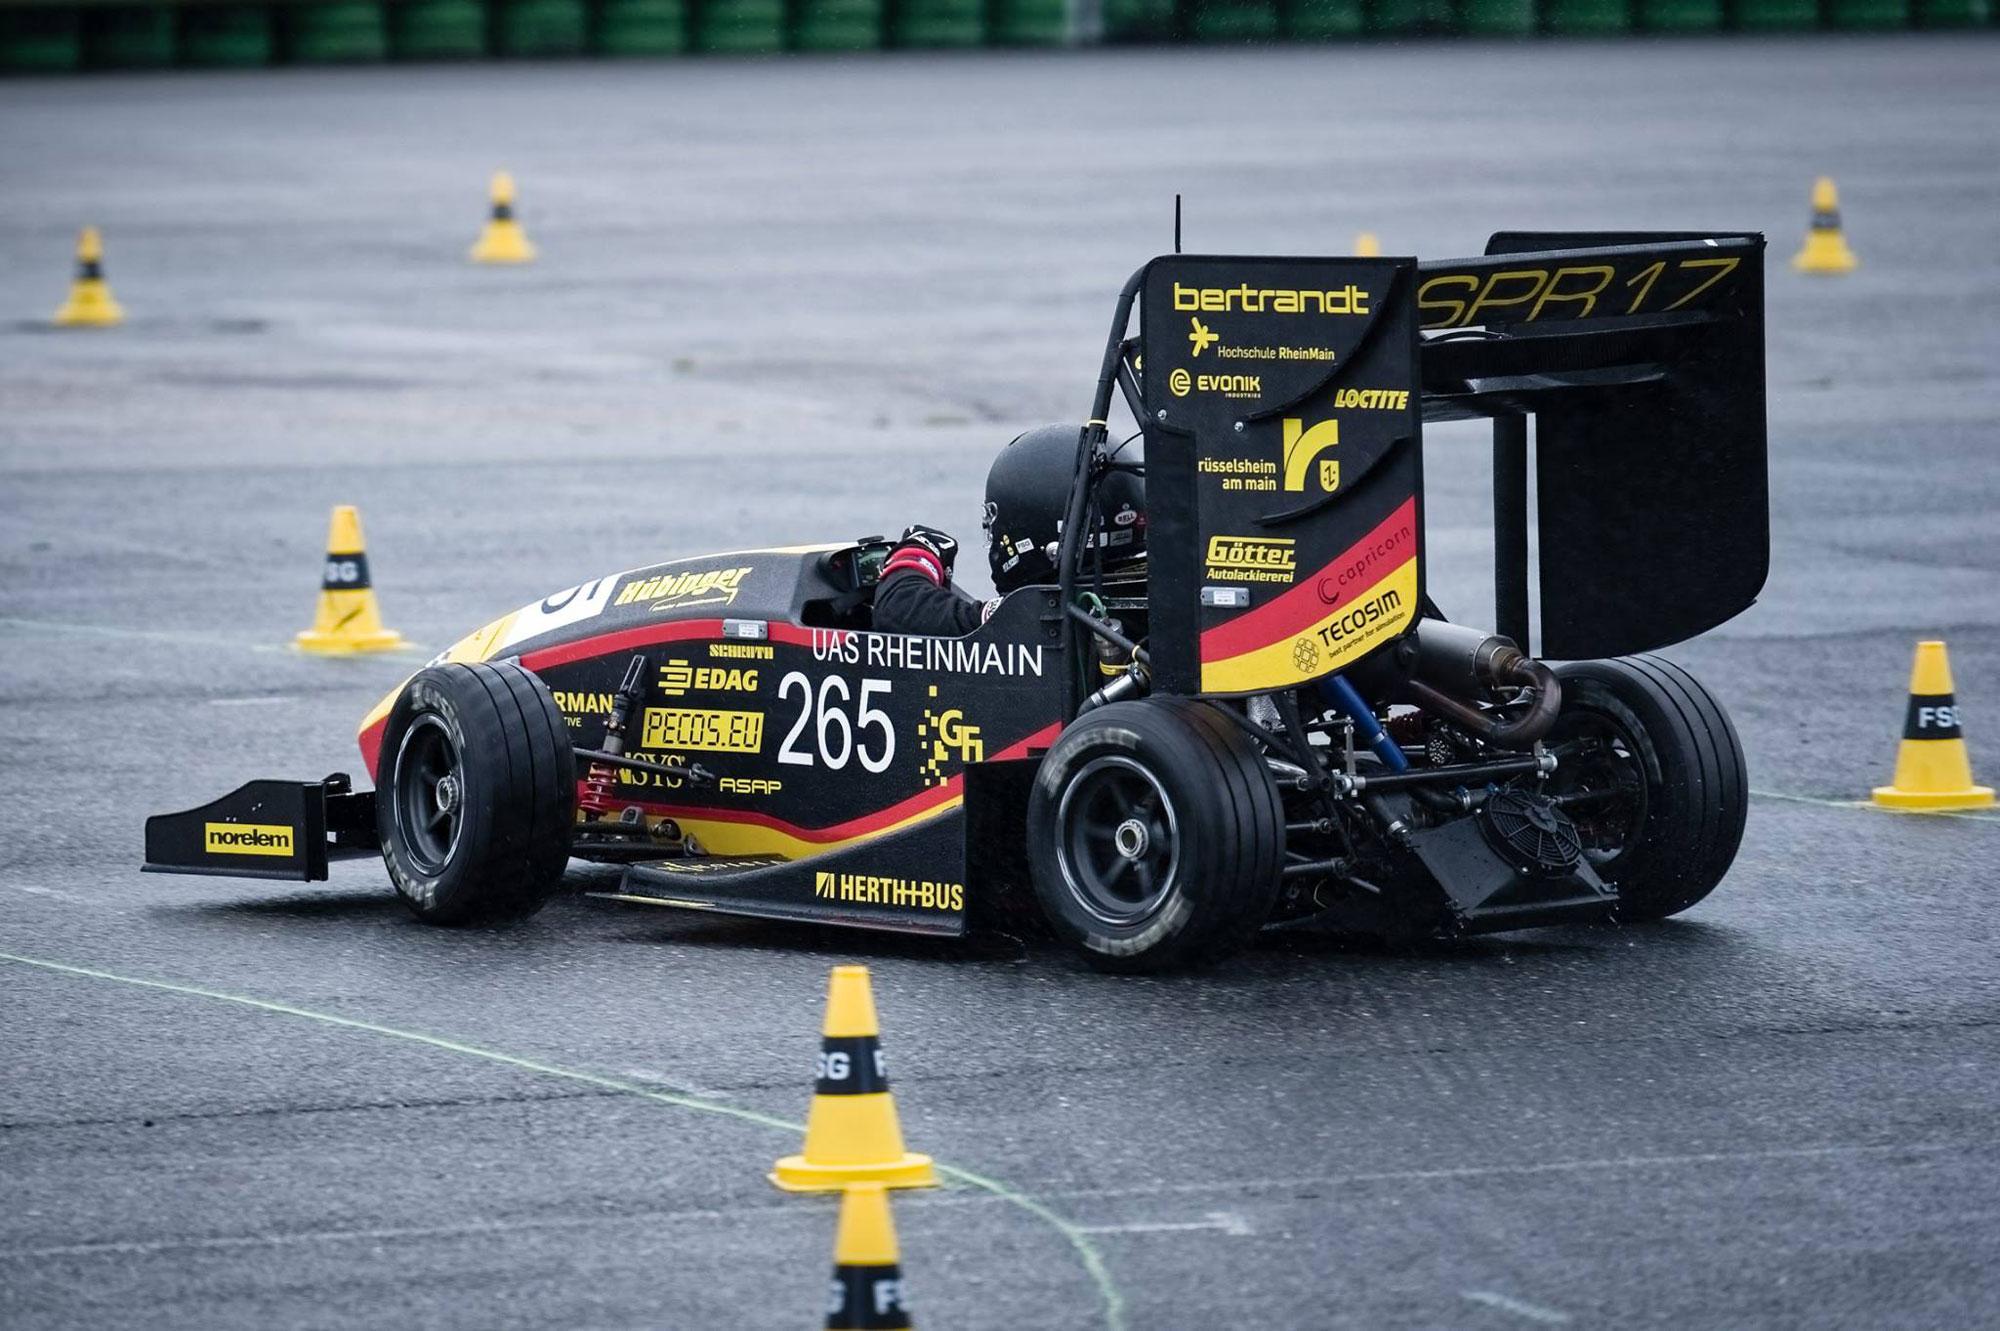 Scuderia Mensa, students racing team sponsorship team Herth+Buss